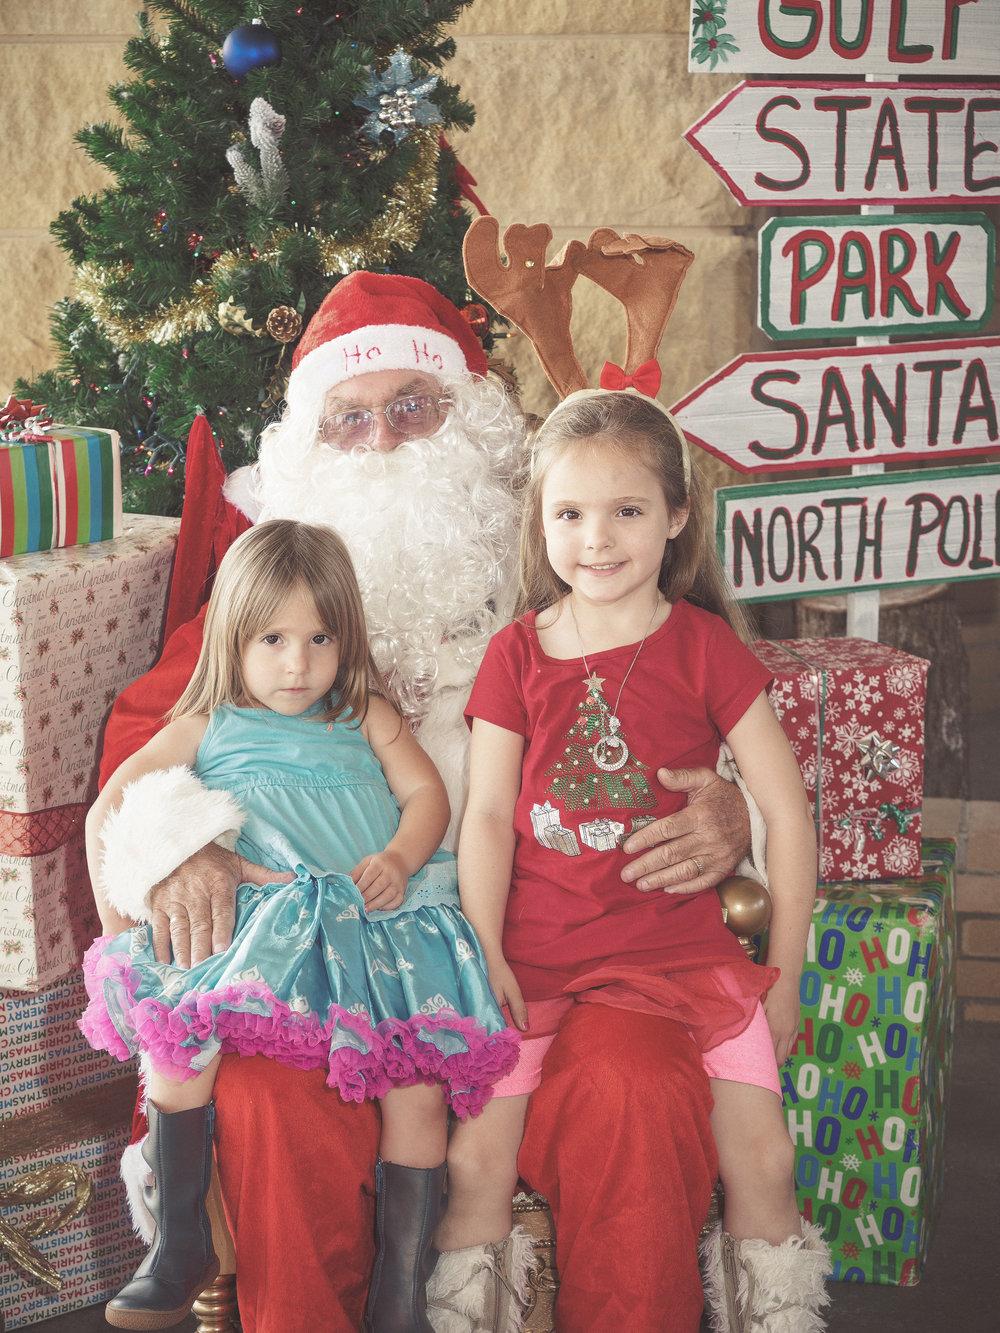 Coastal-Christmas-2017-Gulf-State-Park-Beach-Pavilion-002